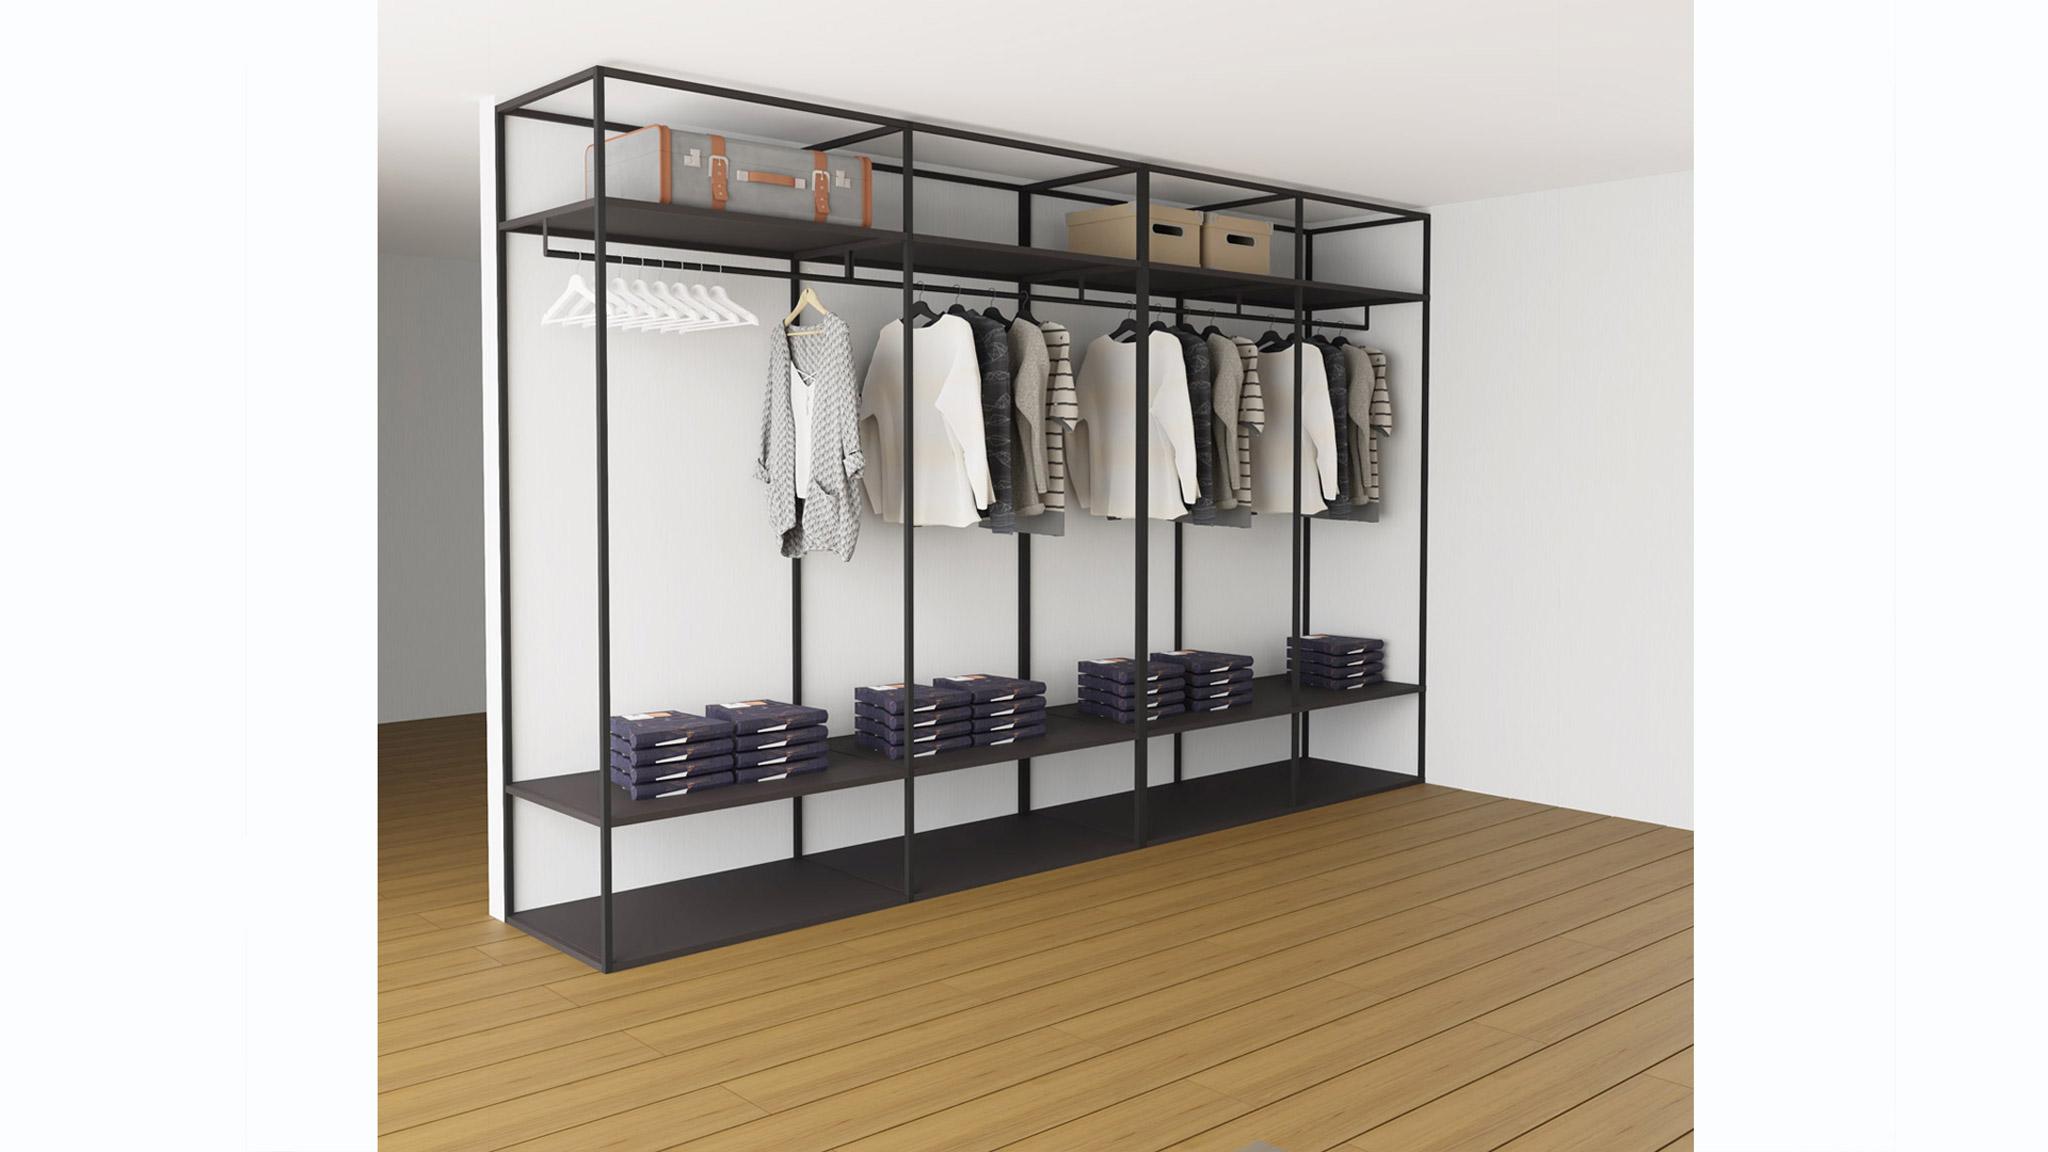 atelier4-anna-junca-interiorista-banyoles-interiorisme-disseny-interiors-arquitectura-interior-santa-clara-vestidor-ferro-mobiliari-a-mida-girona-web-3